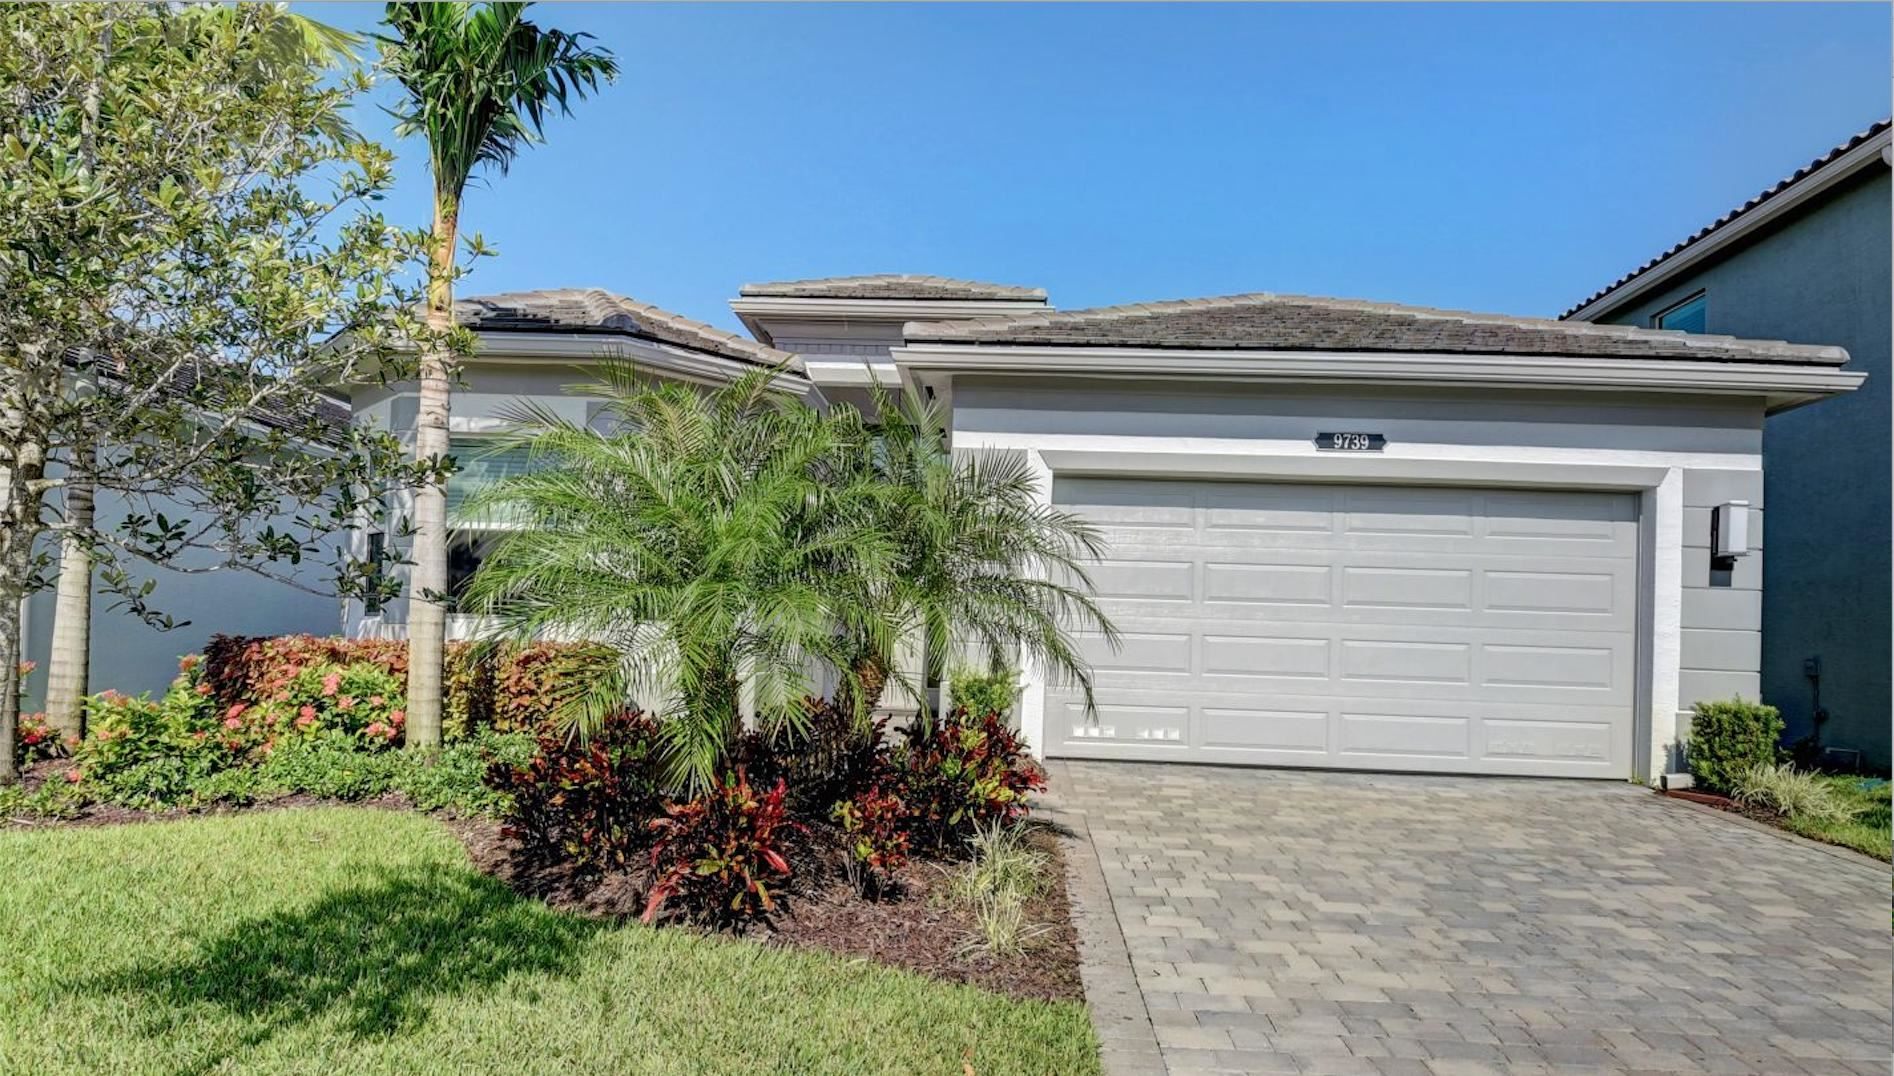 9739 Salty Bay Drive, Delray Beach, FL 33446 - #: RX-10671319